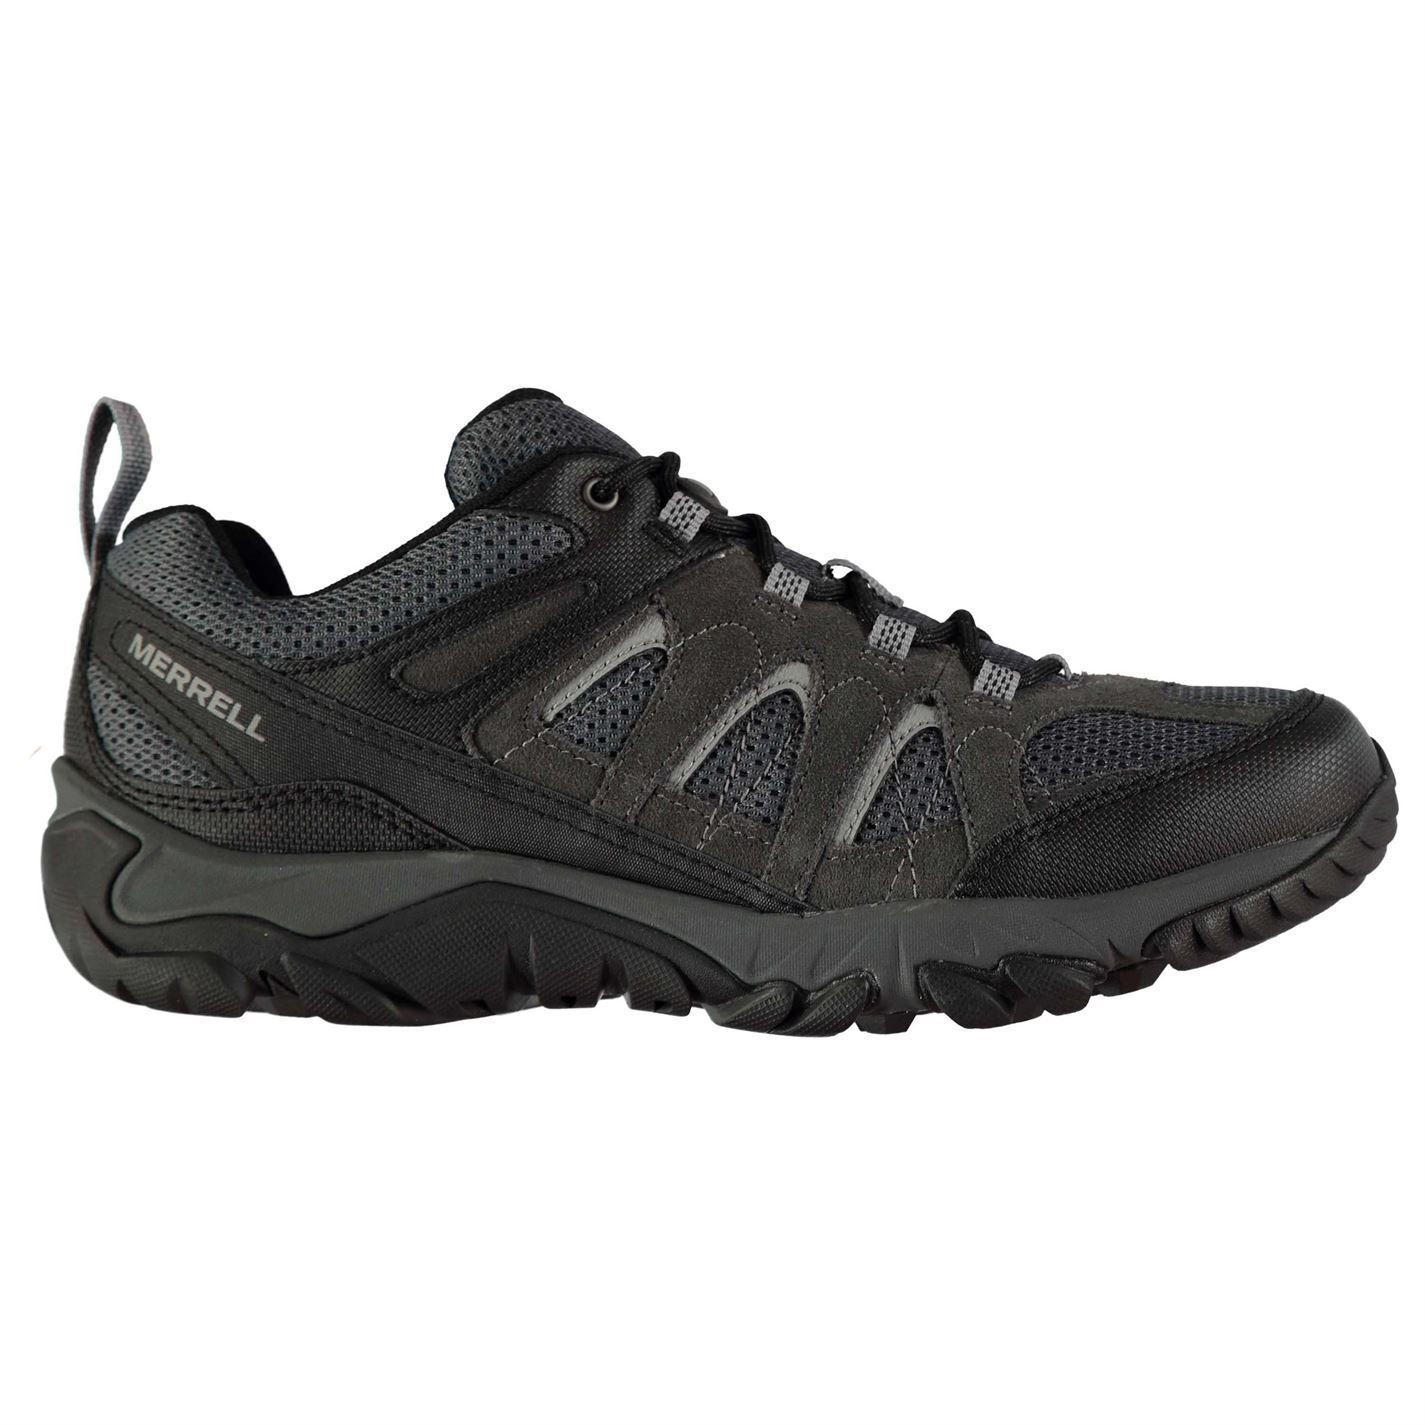 zapatos merrell hombre colombia num